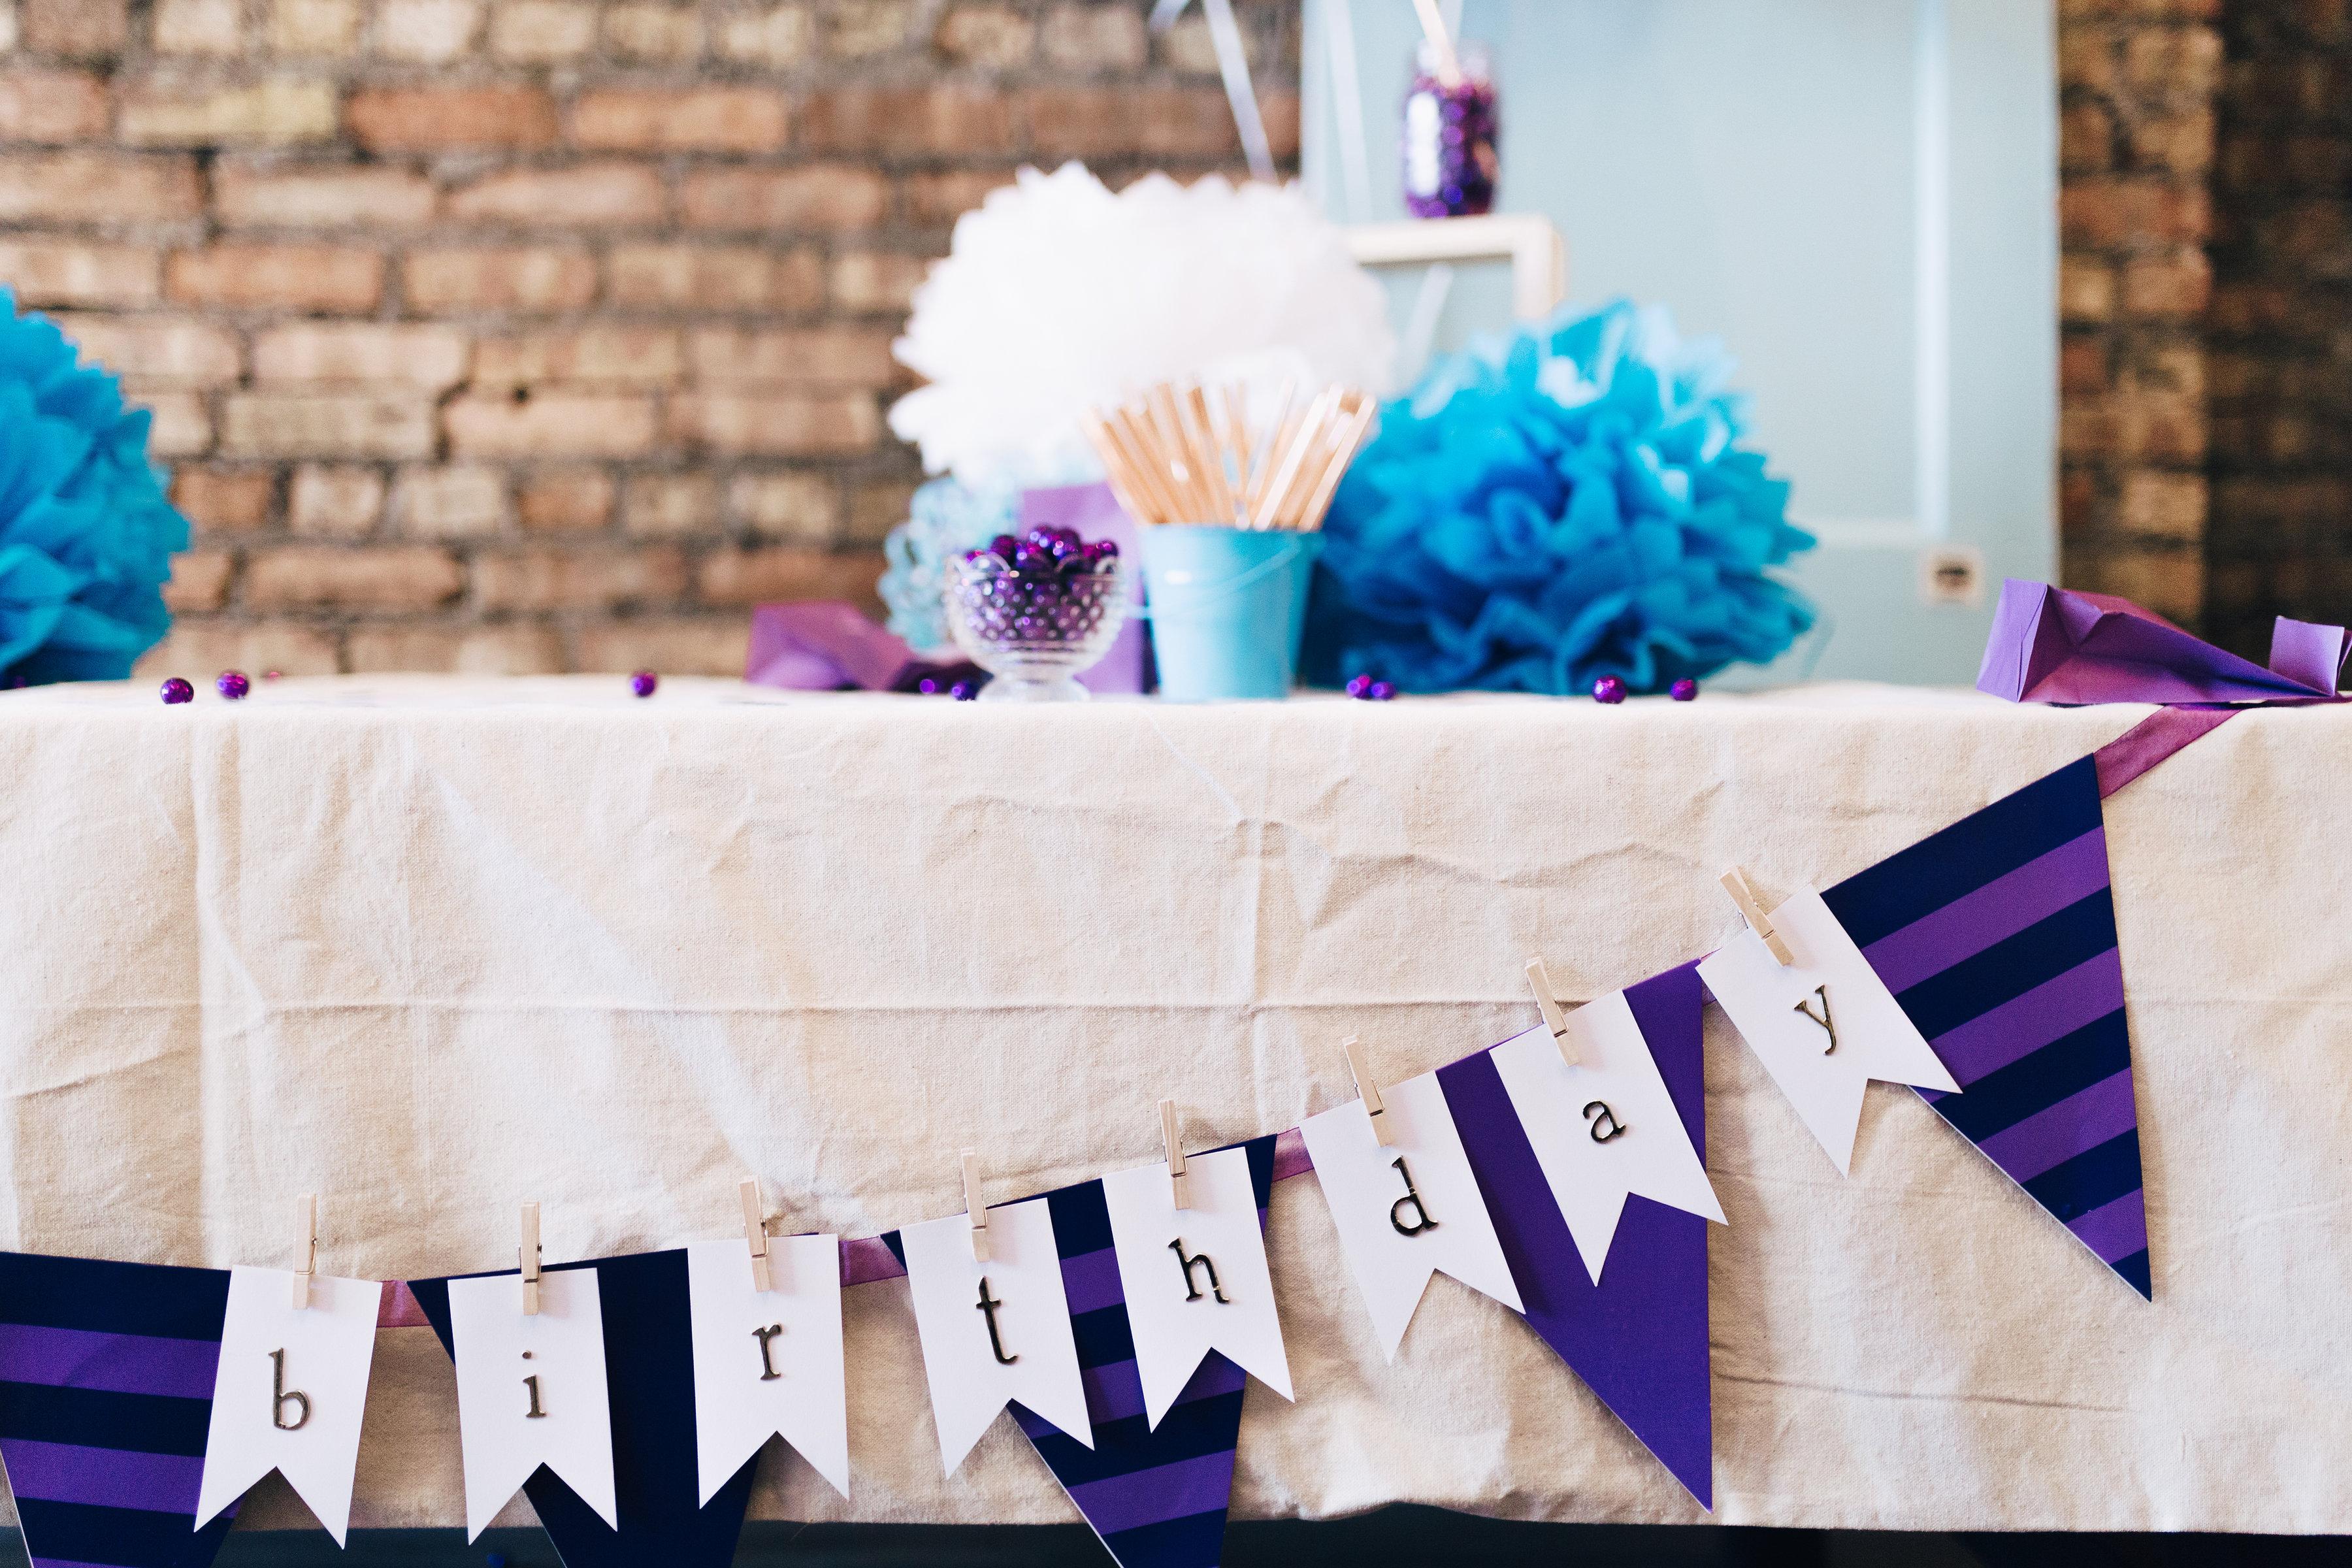 Indigo & Violet Studio - Chicago craft events venue rentals